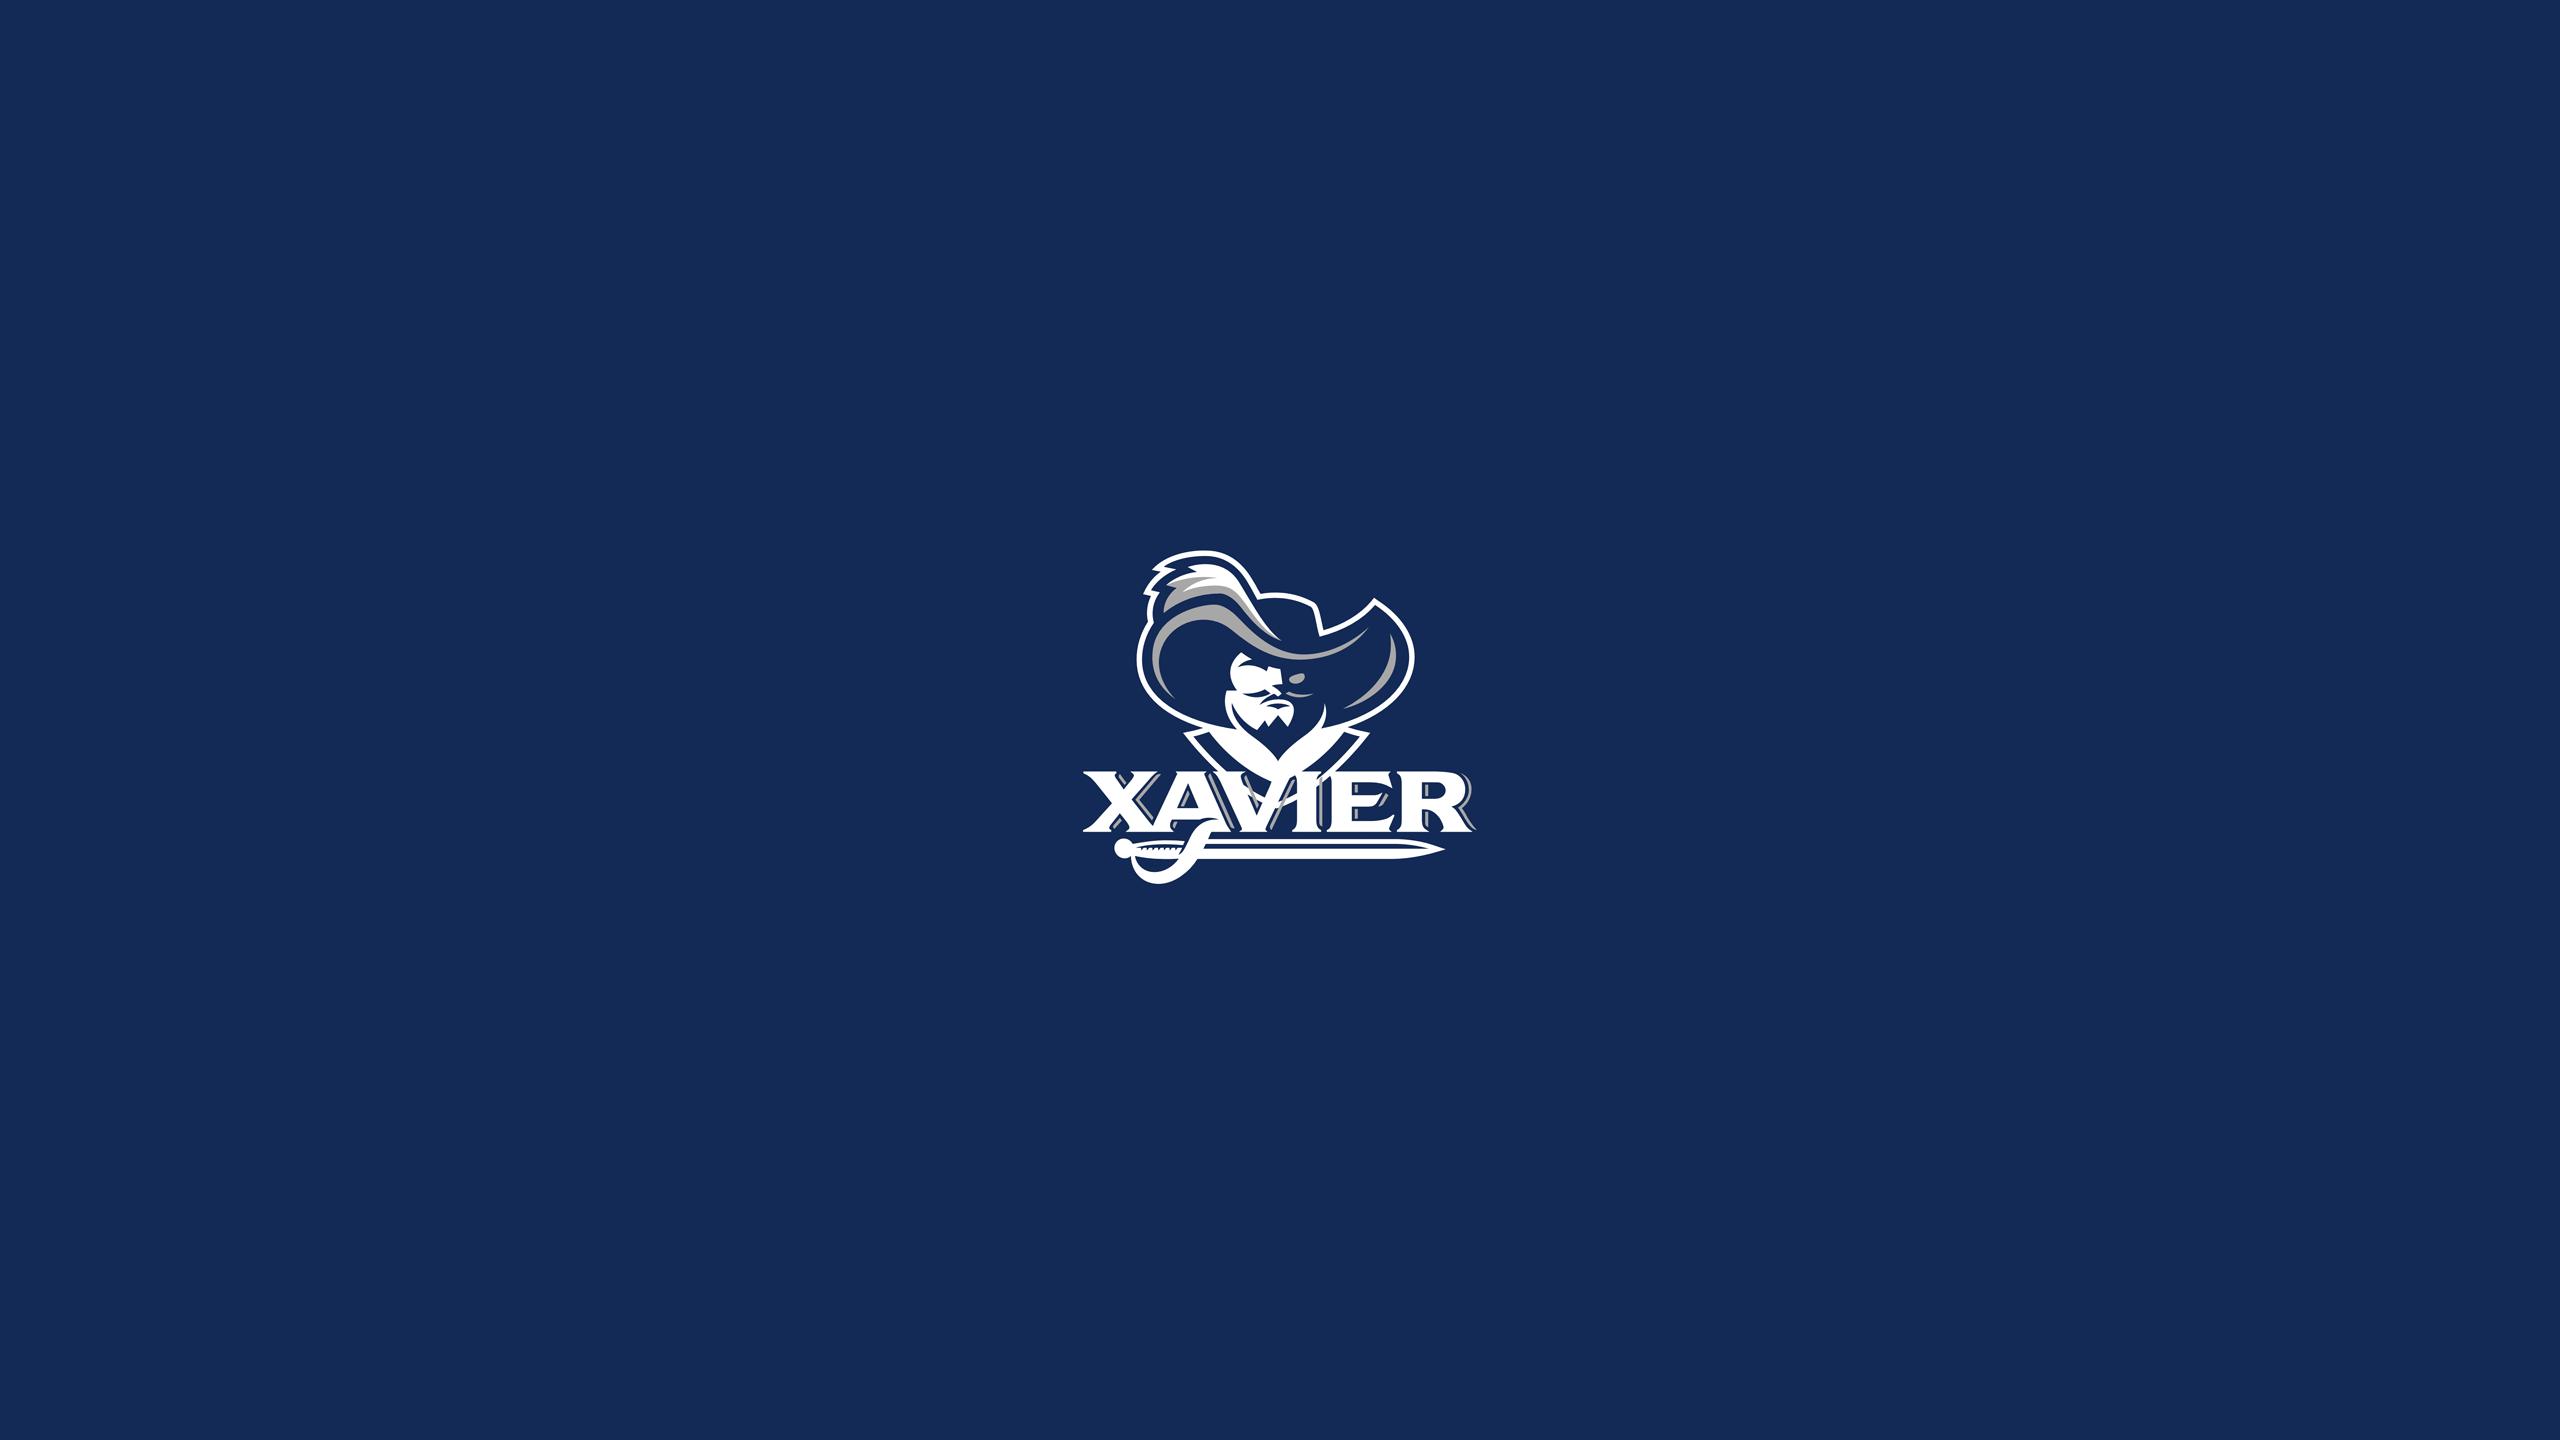 Xavier University Musketeers